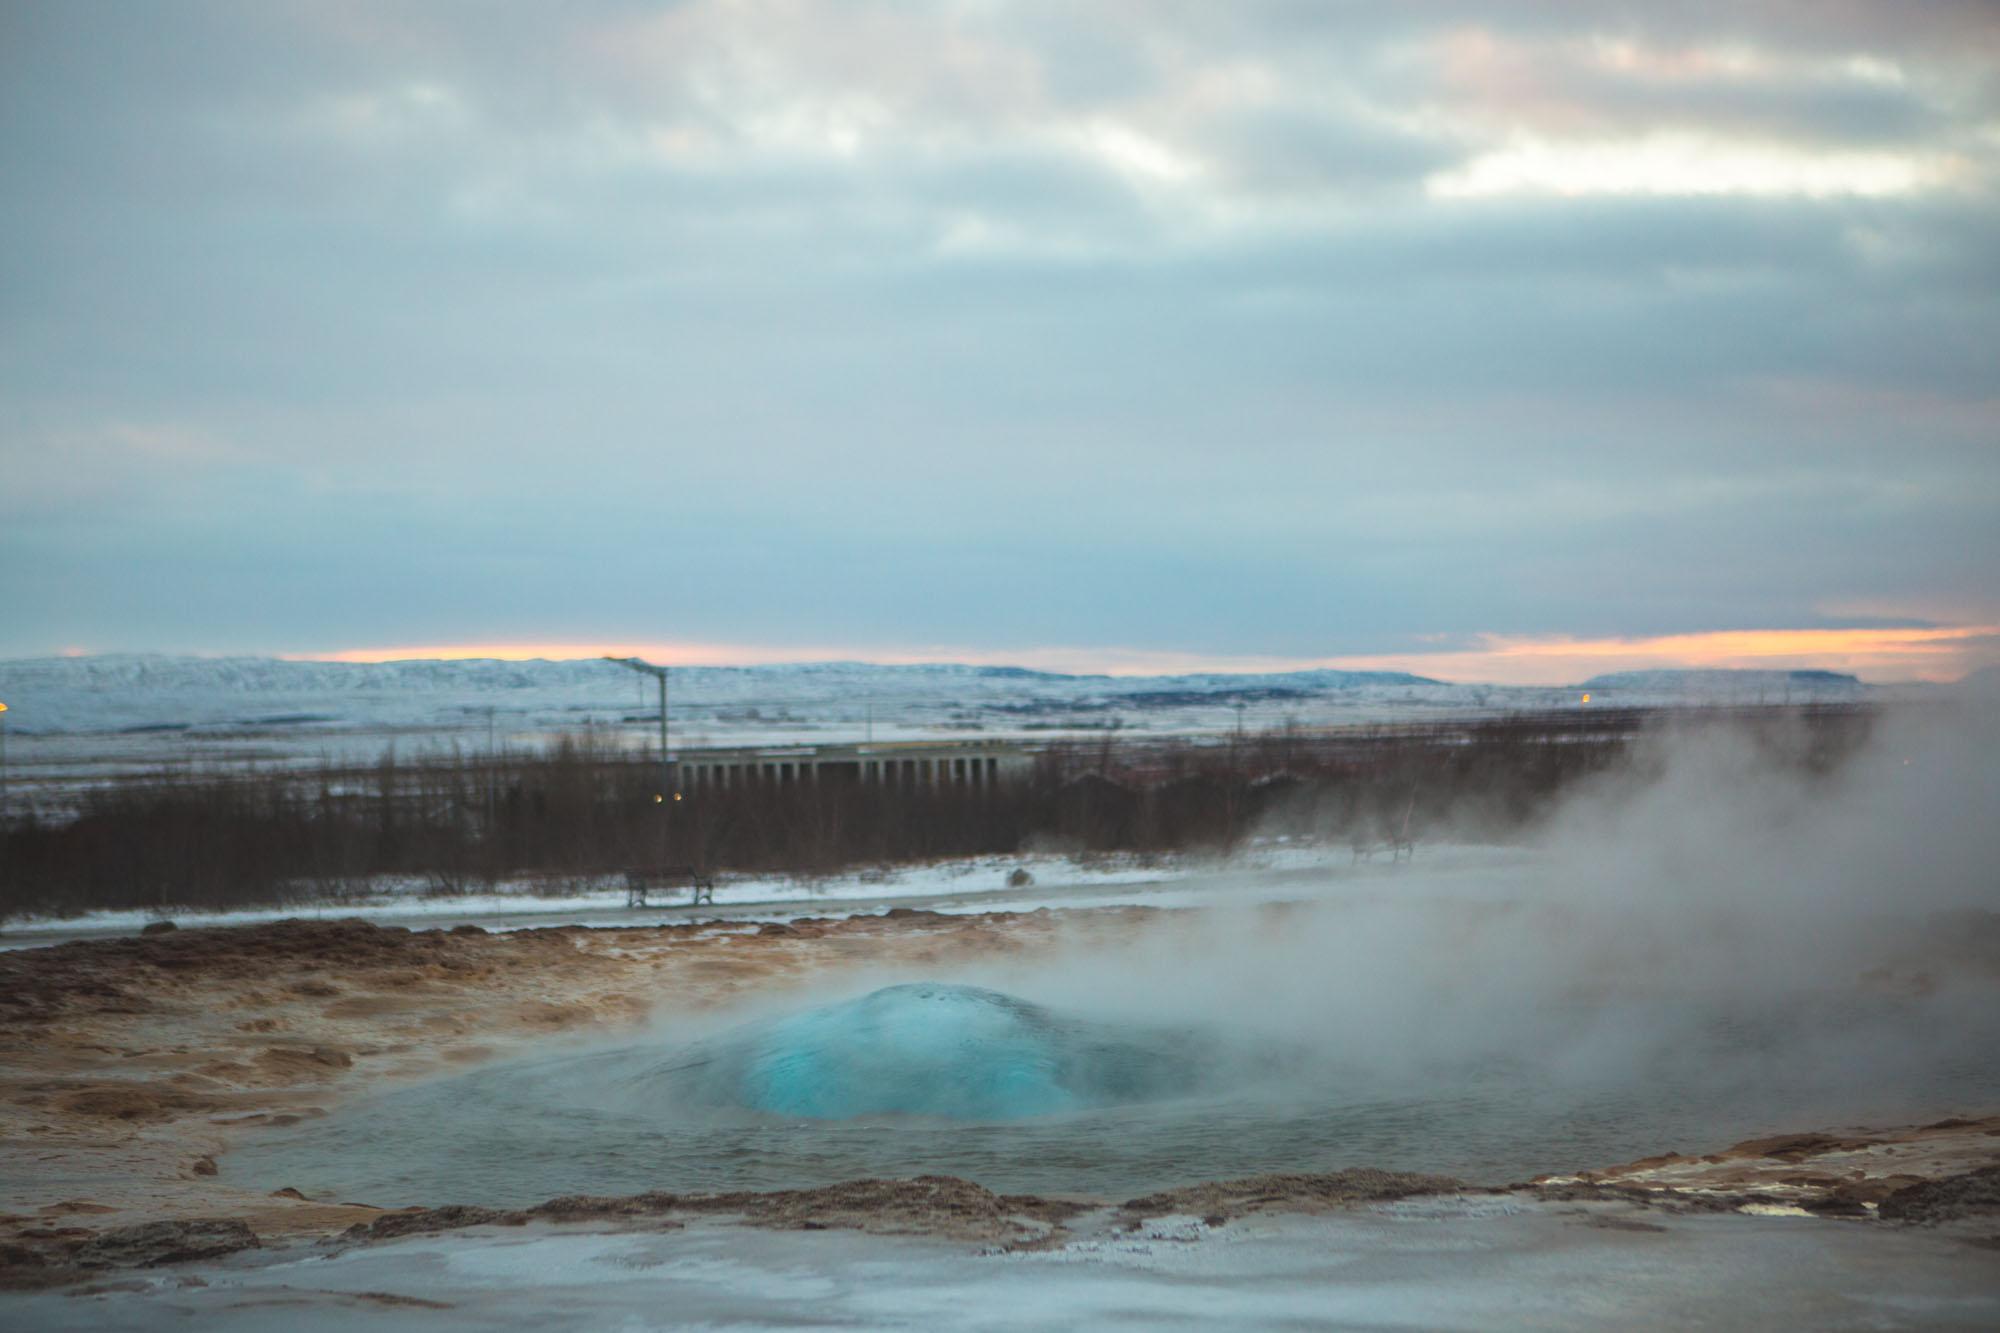 Iceland inspiration – Golden Circle – Geyser